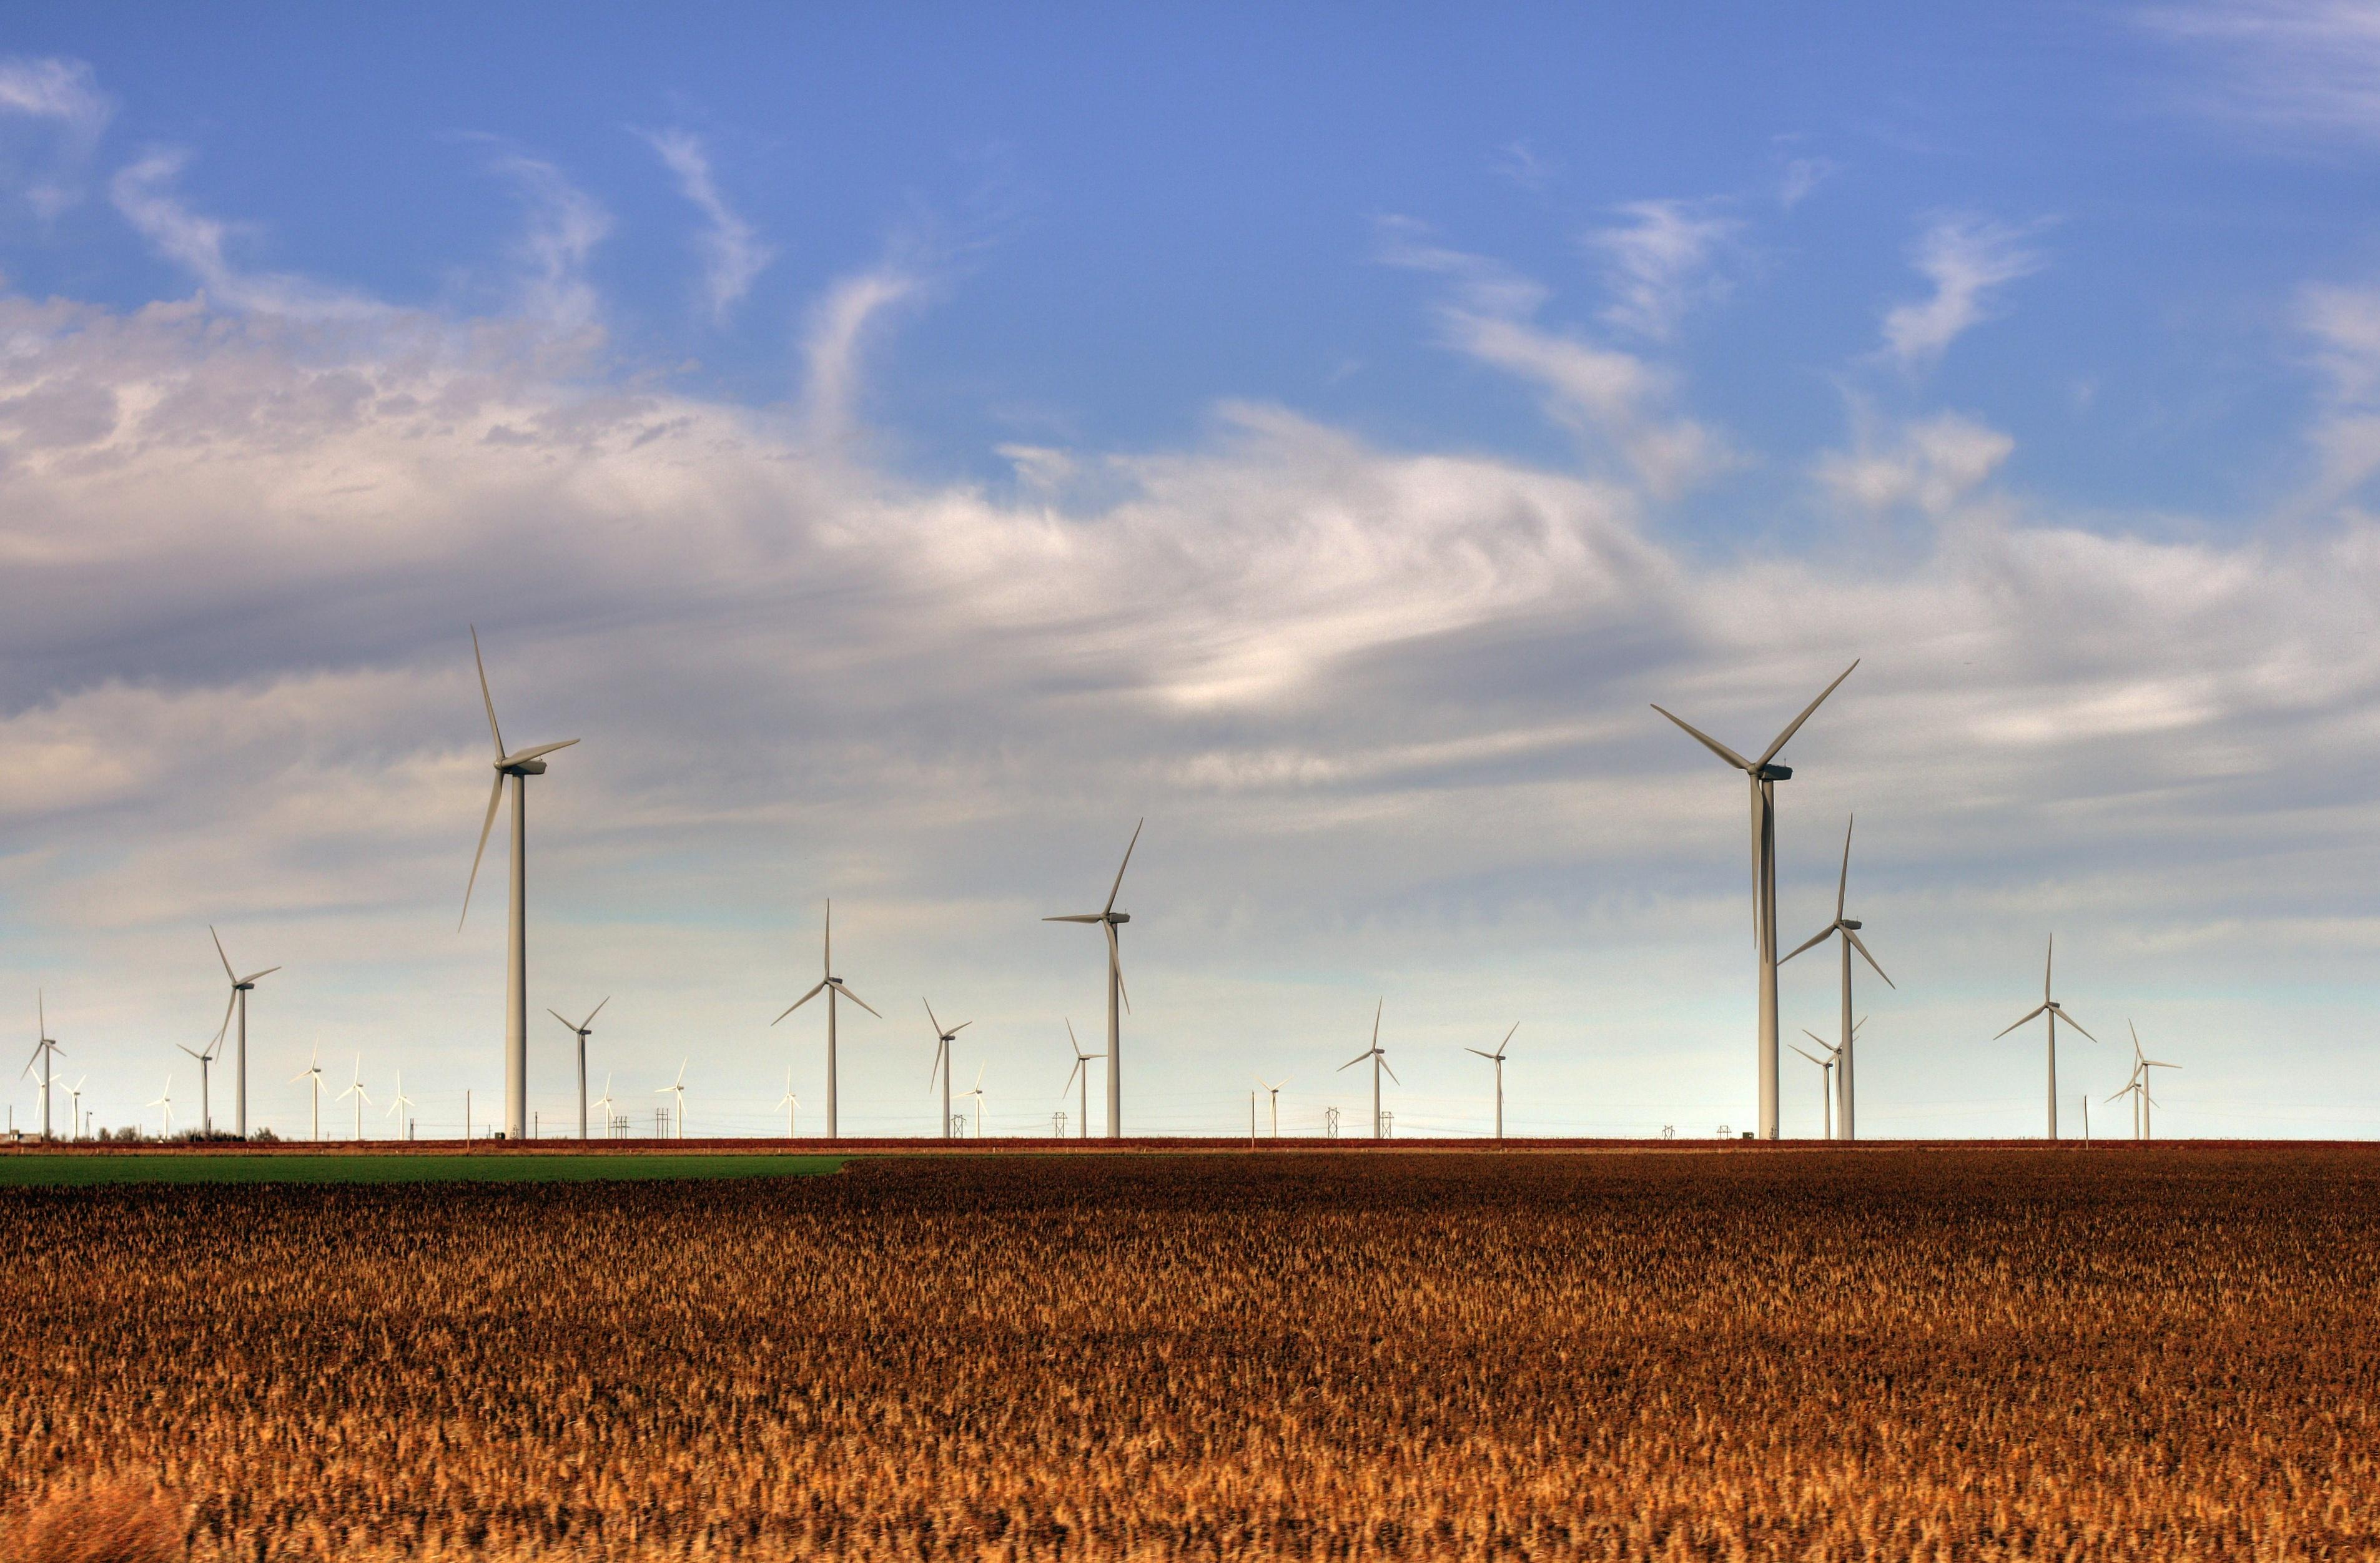 Iowa Wind Farms The Smoky Hills Wind Farm in